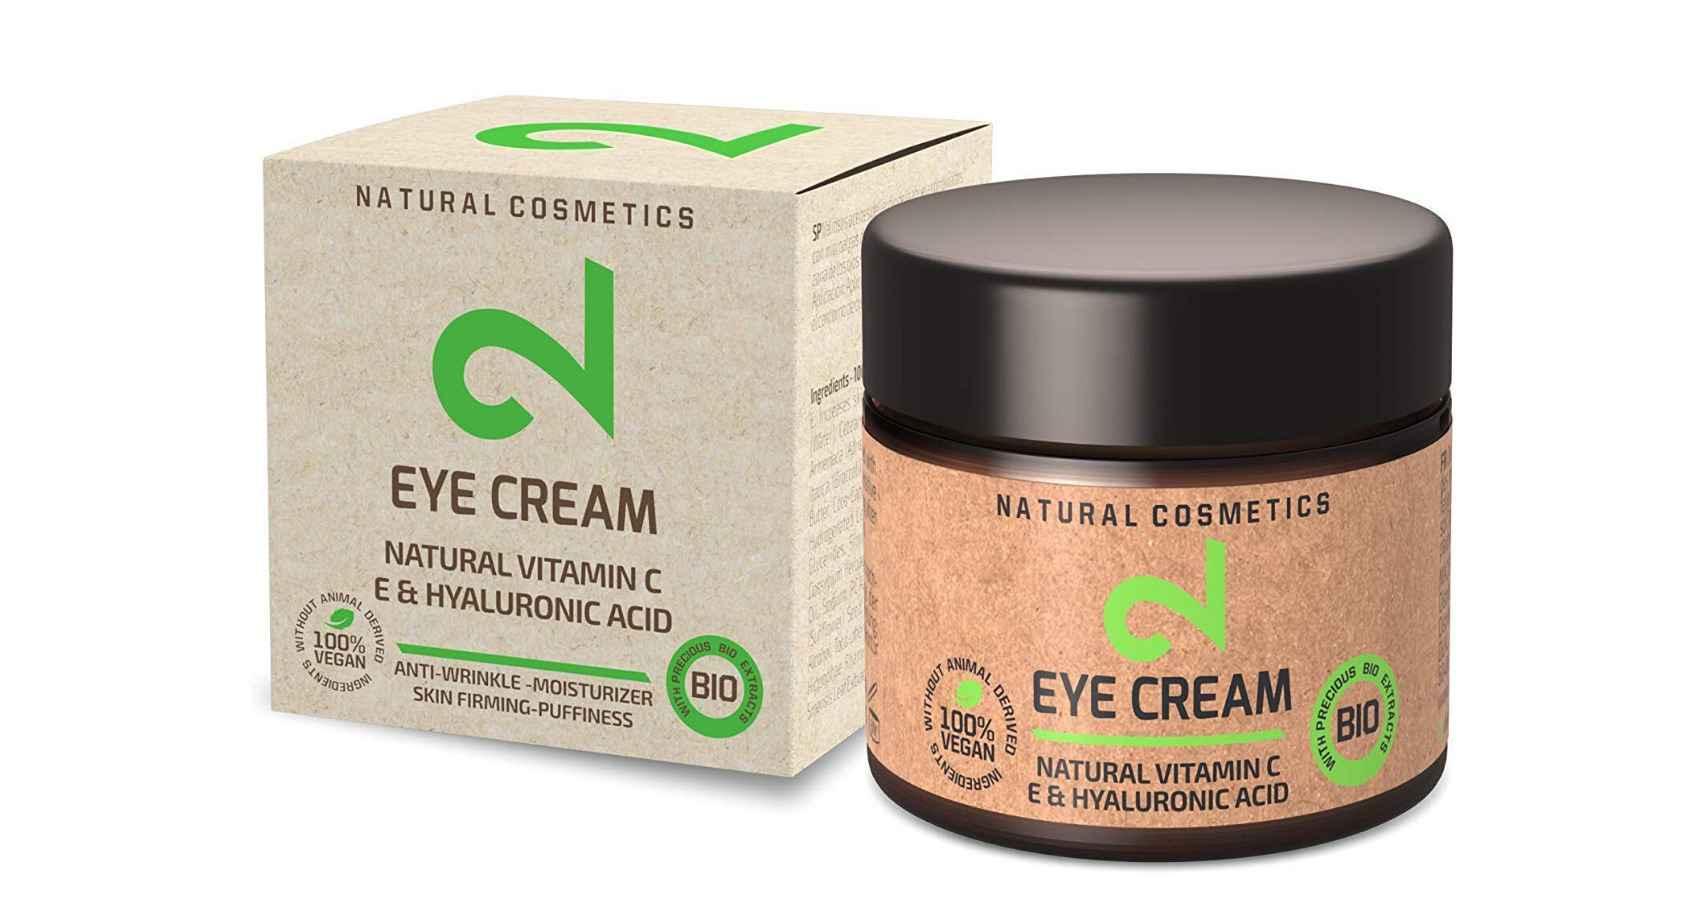 Dual Eye Cream